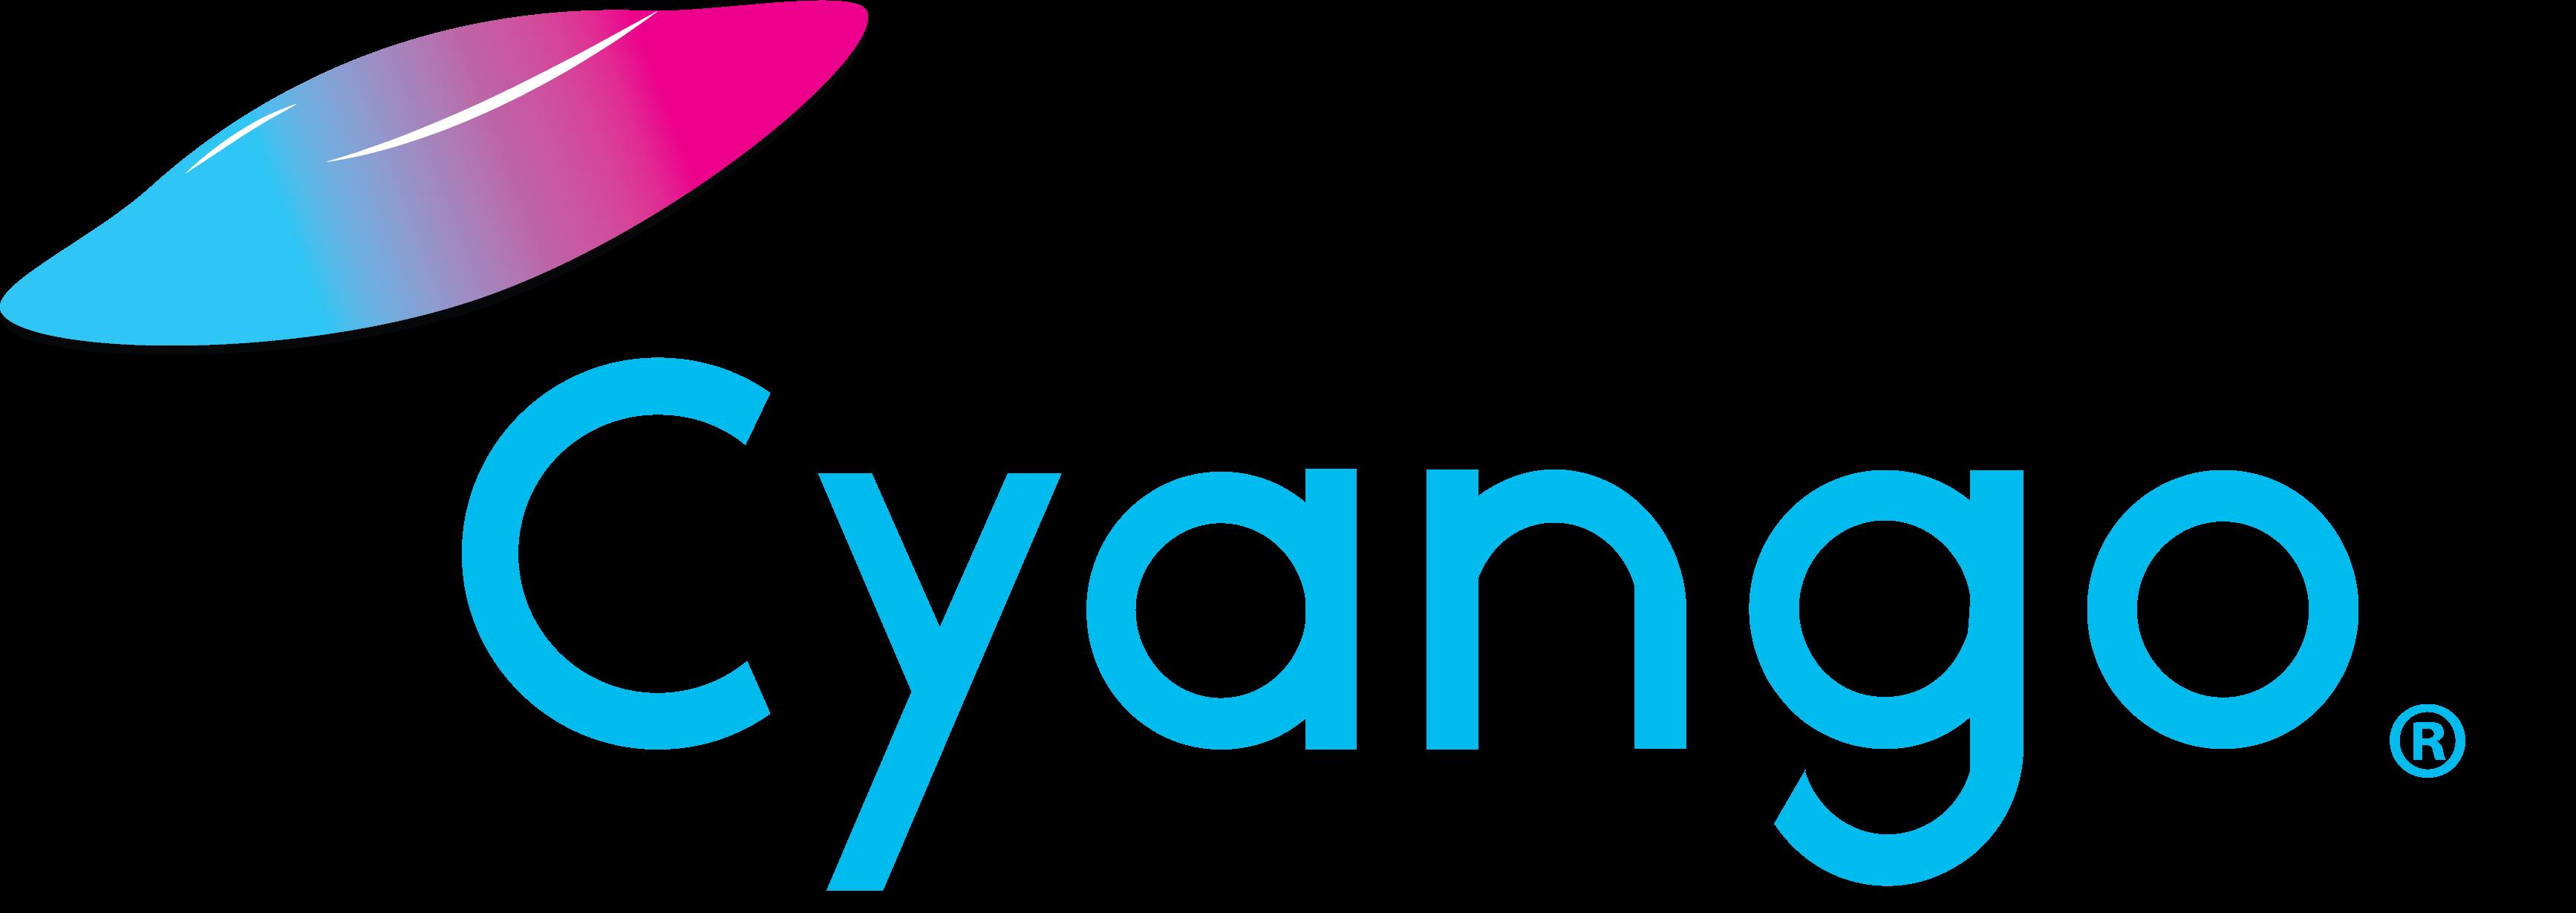 Cyango